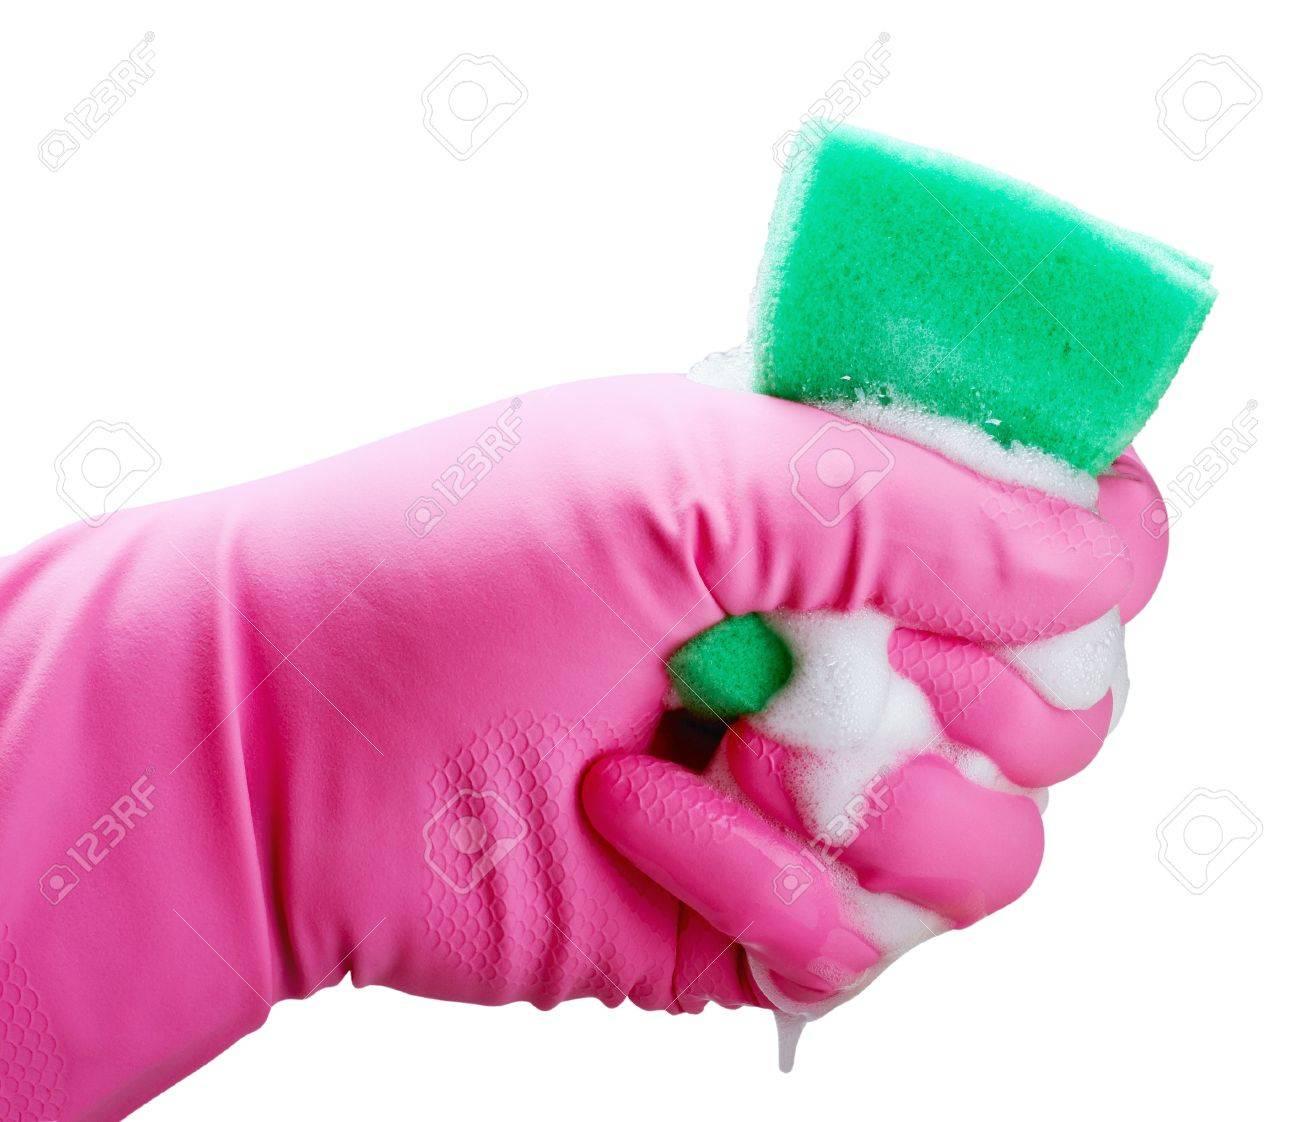 Hand holding white cleaning sponge isolated on white Stock Photo - 19683429